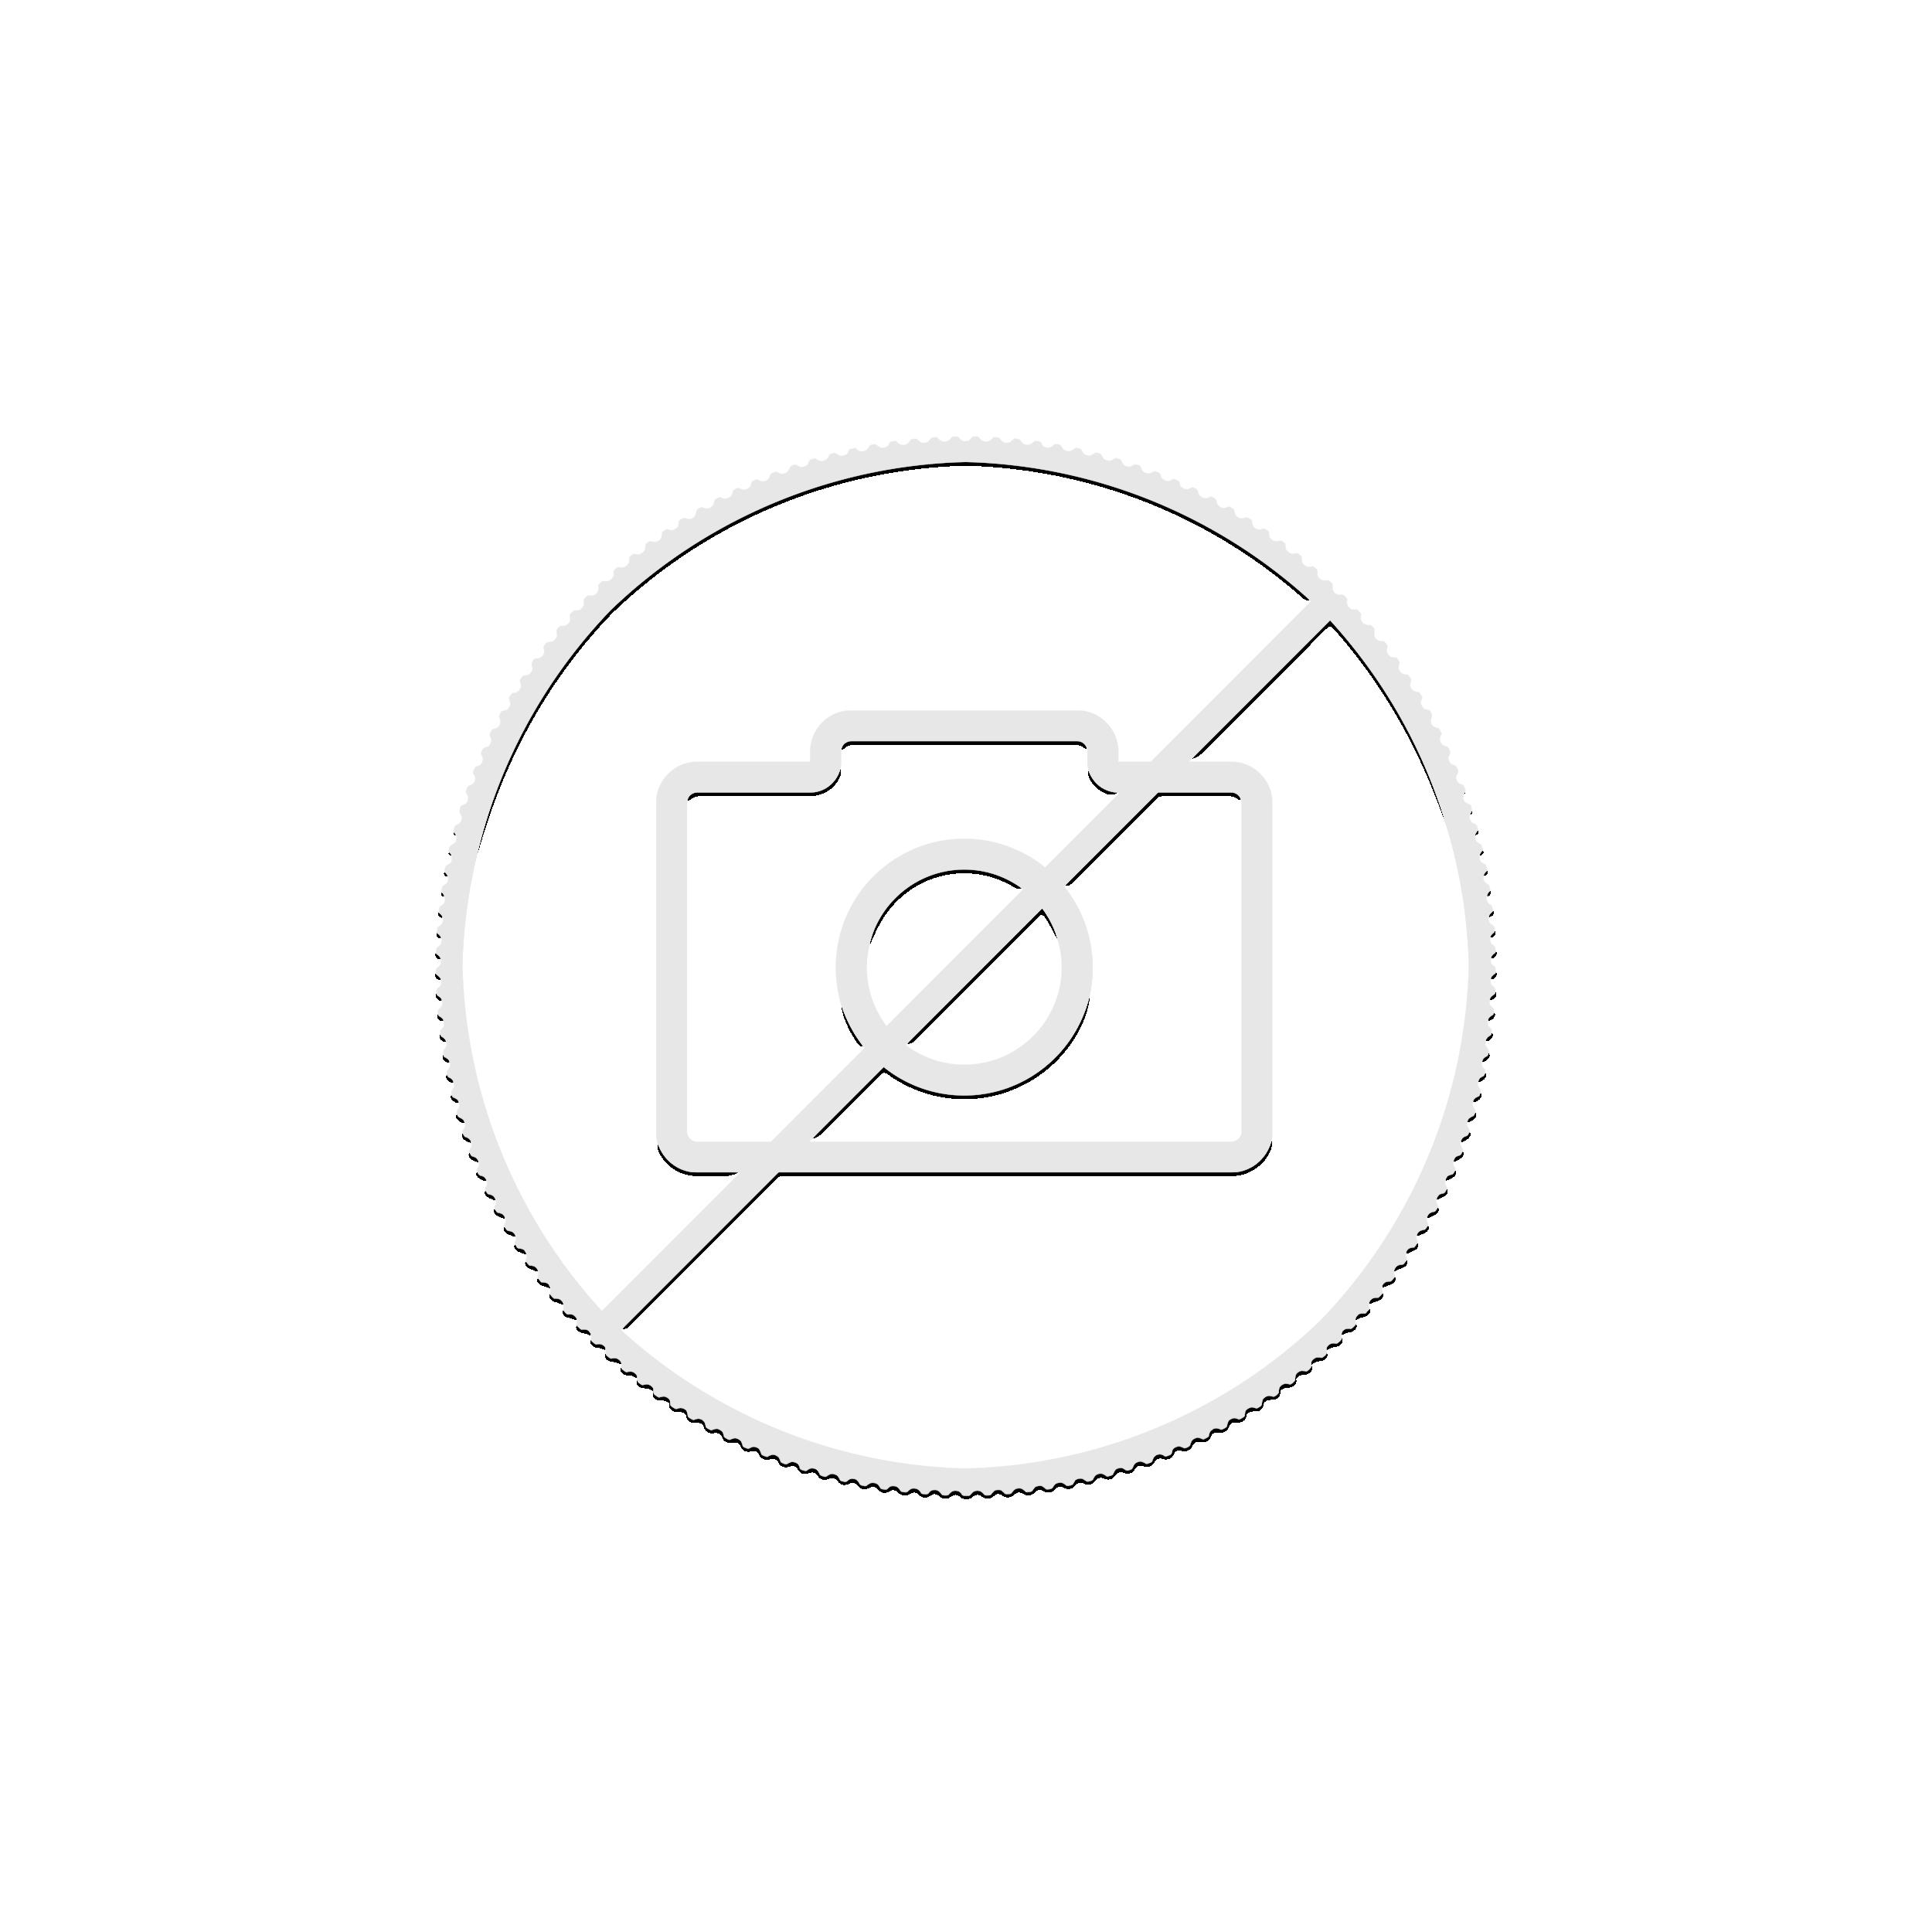 2 kilo puur zilver Nederlands muntgeld - zak